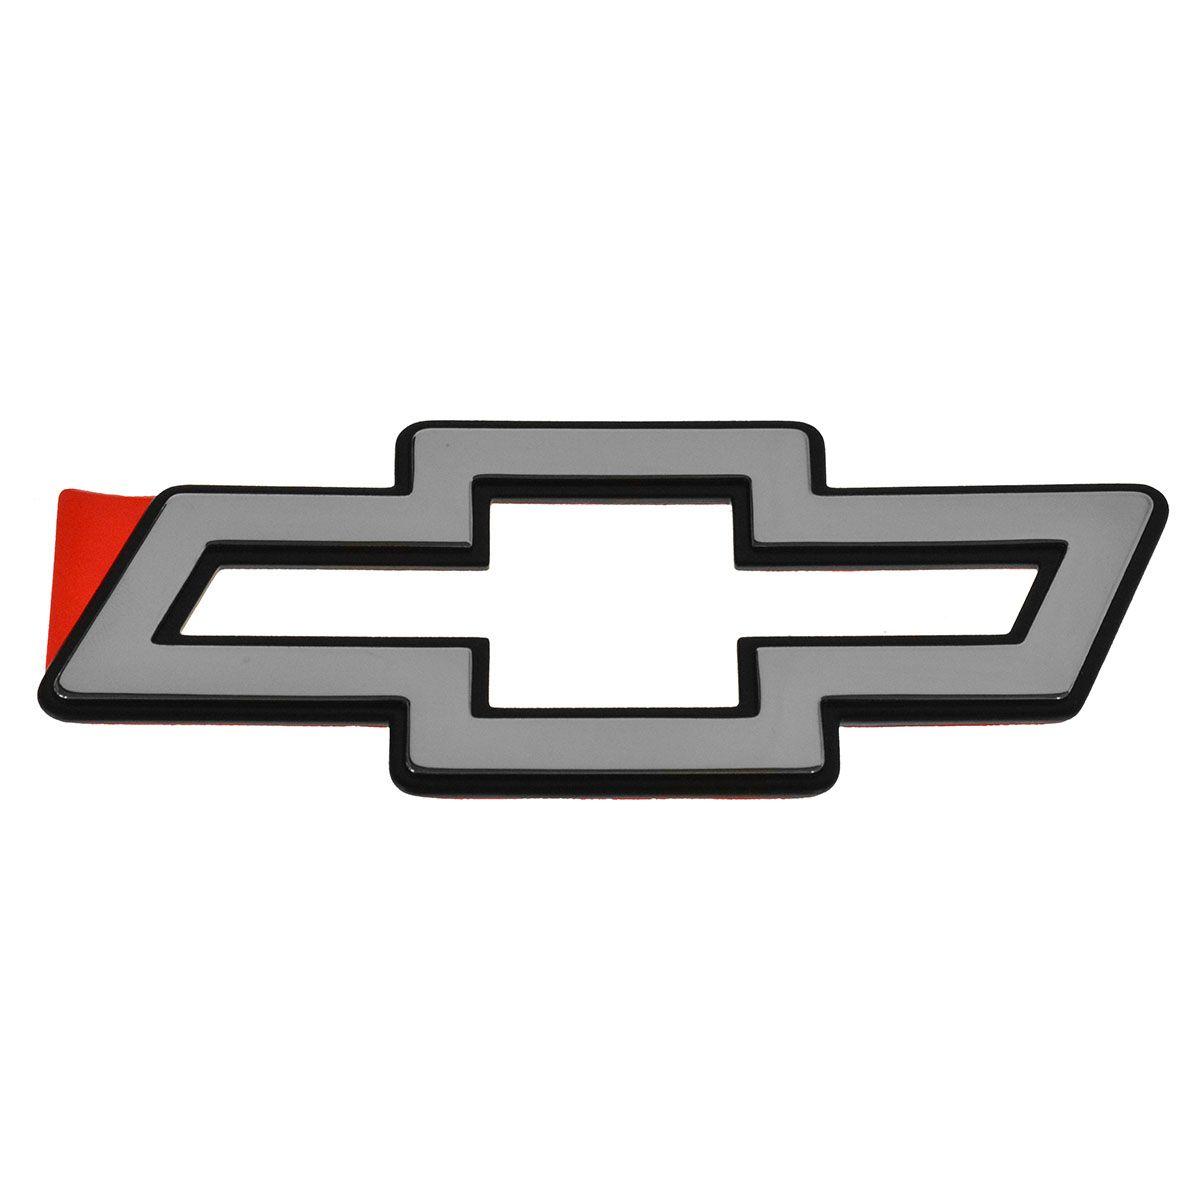 Grille emblem chrome gm bowtie for chevy impala ss ebay grille emblem chrome gm bowtie for chevy impala ss buycottarizona Images